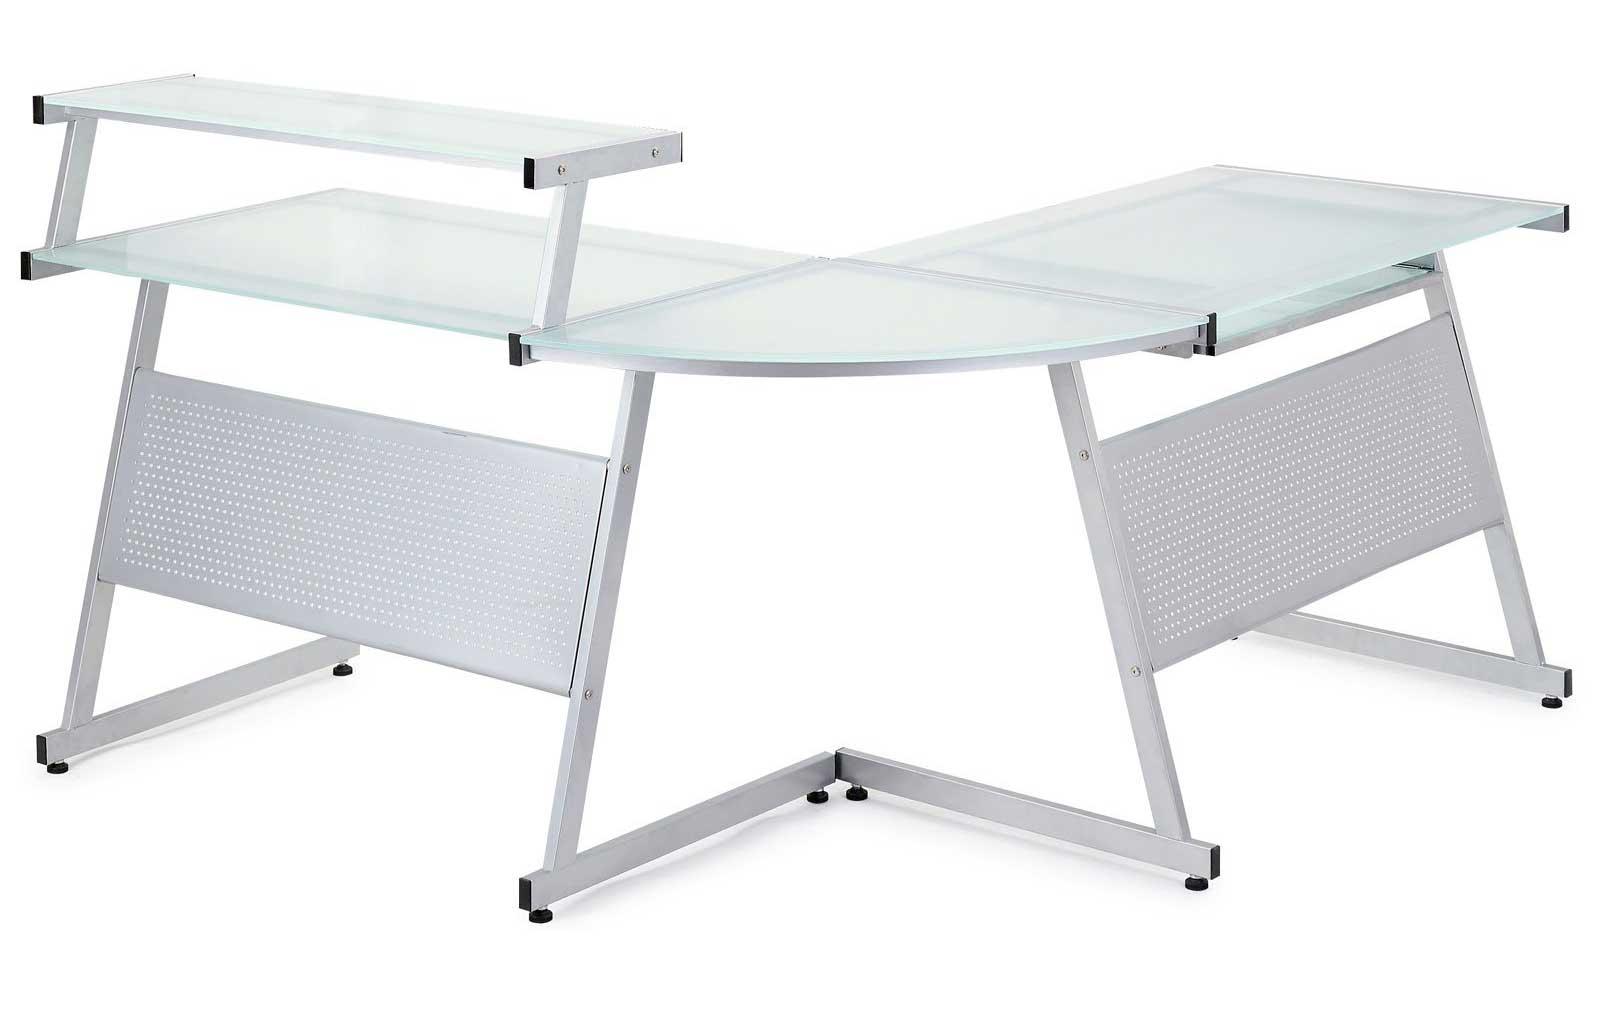 Acero Corner Desk with Solid Glass